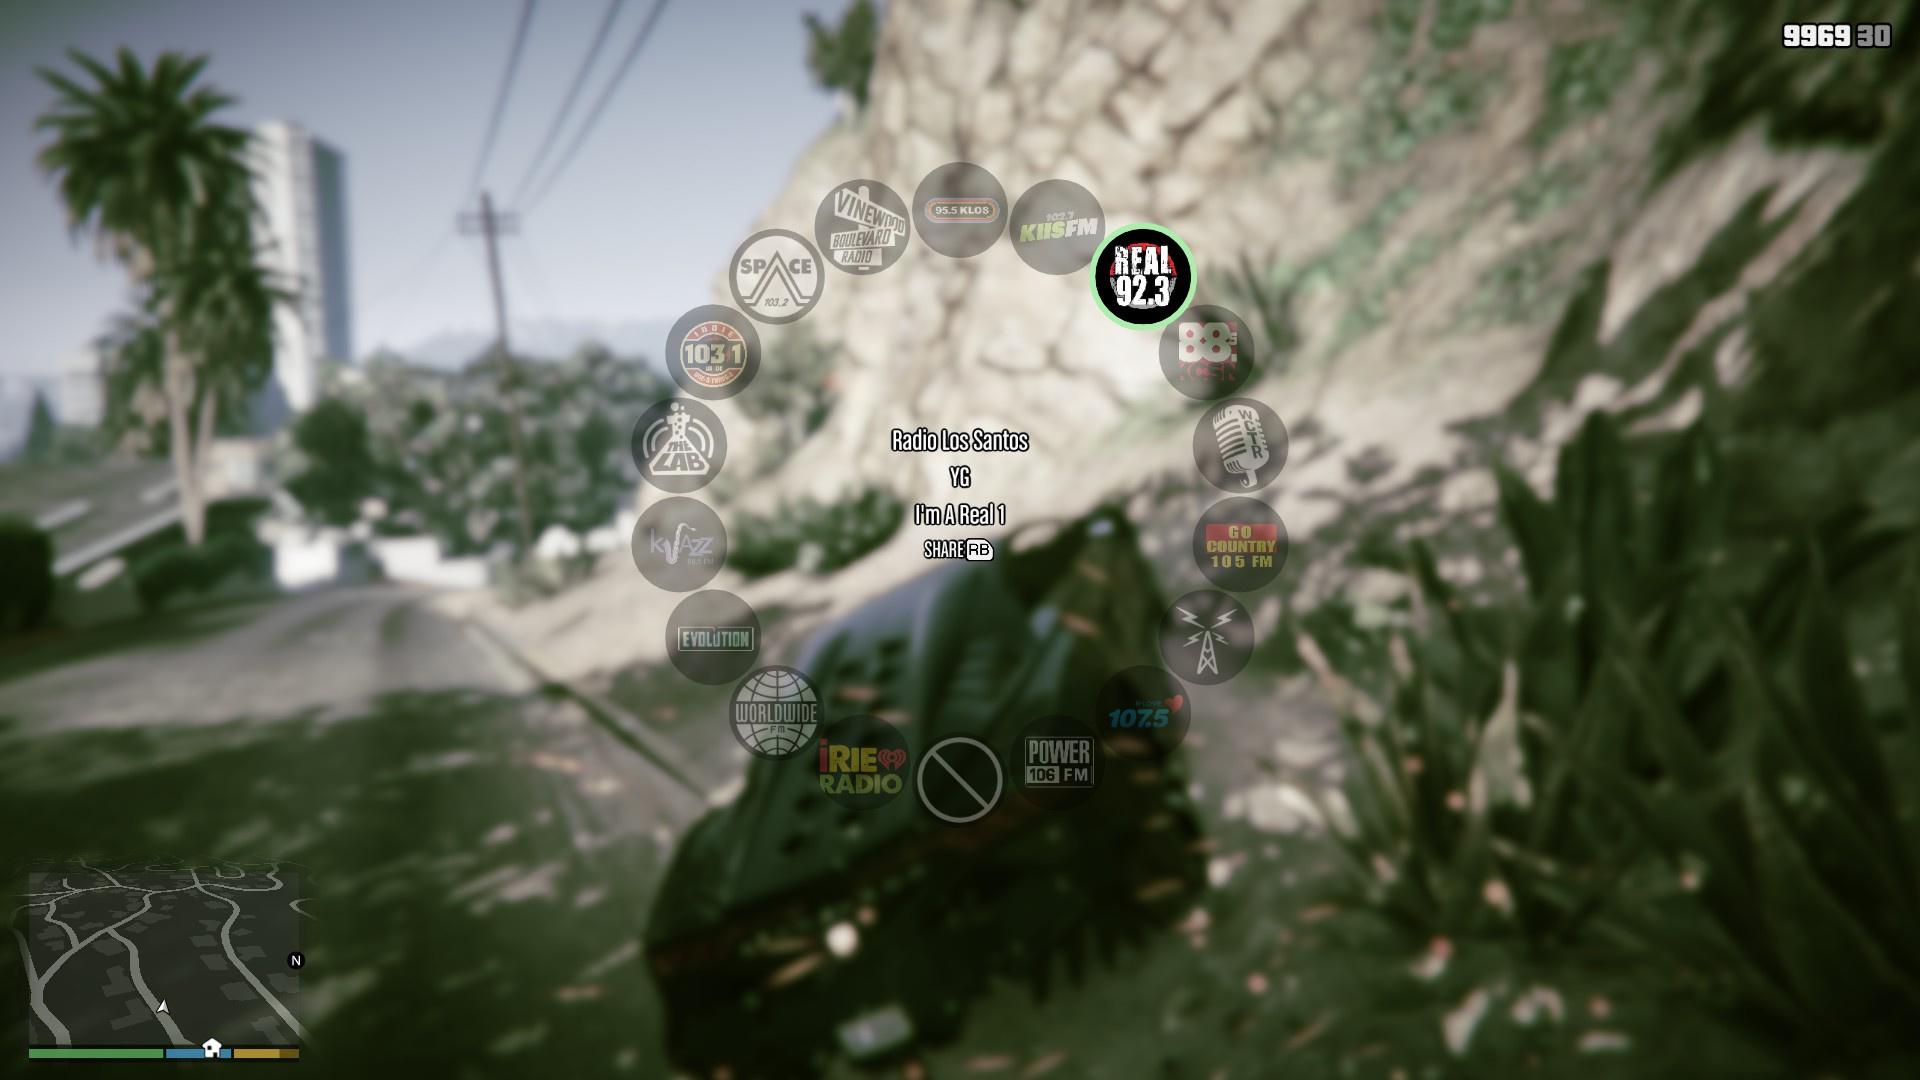 GTA V - Real Life Radio Icons - GTA5-Mods com